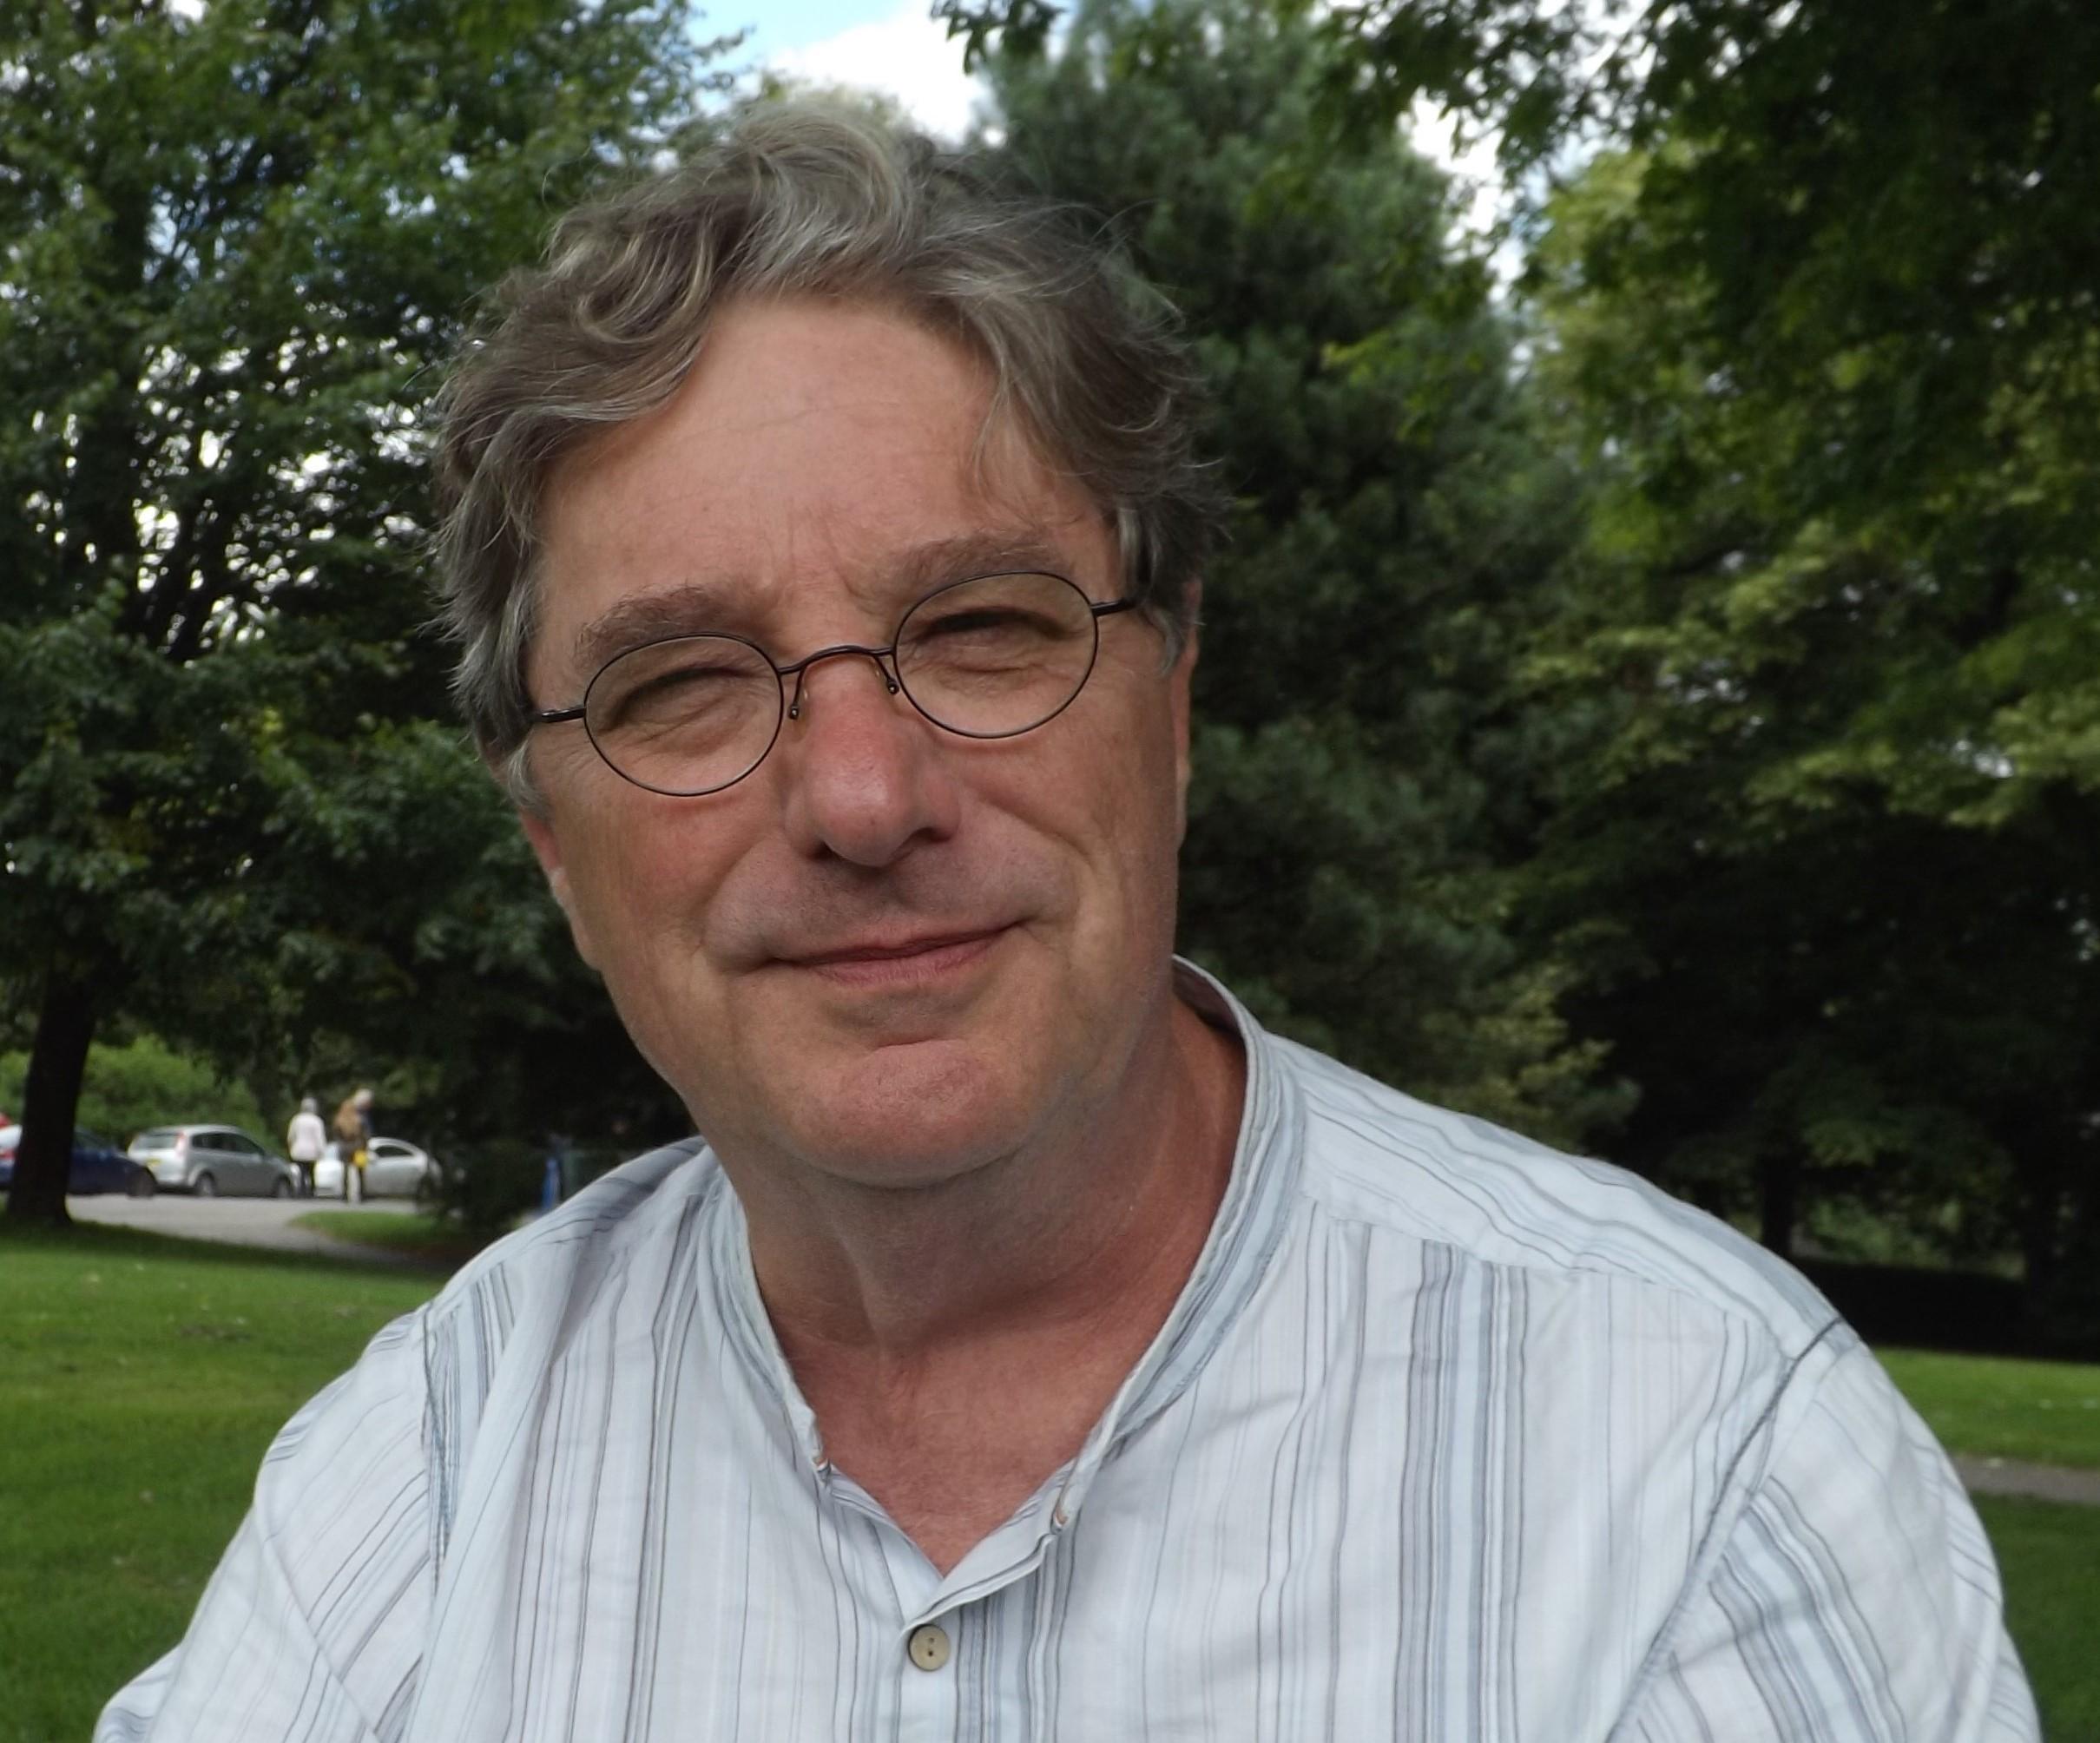 Michael Green